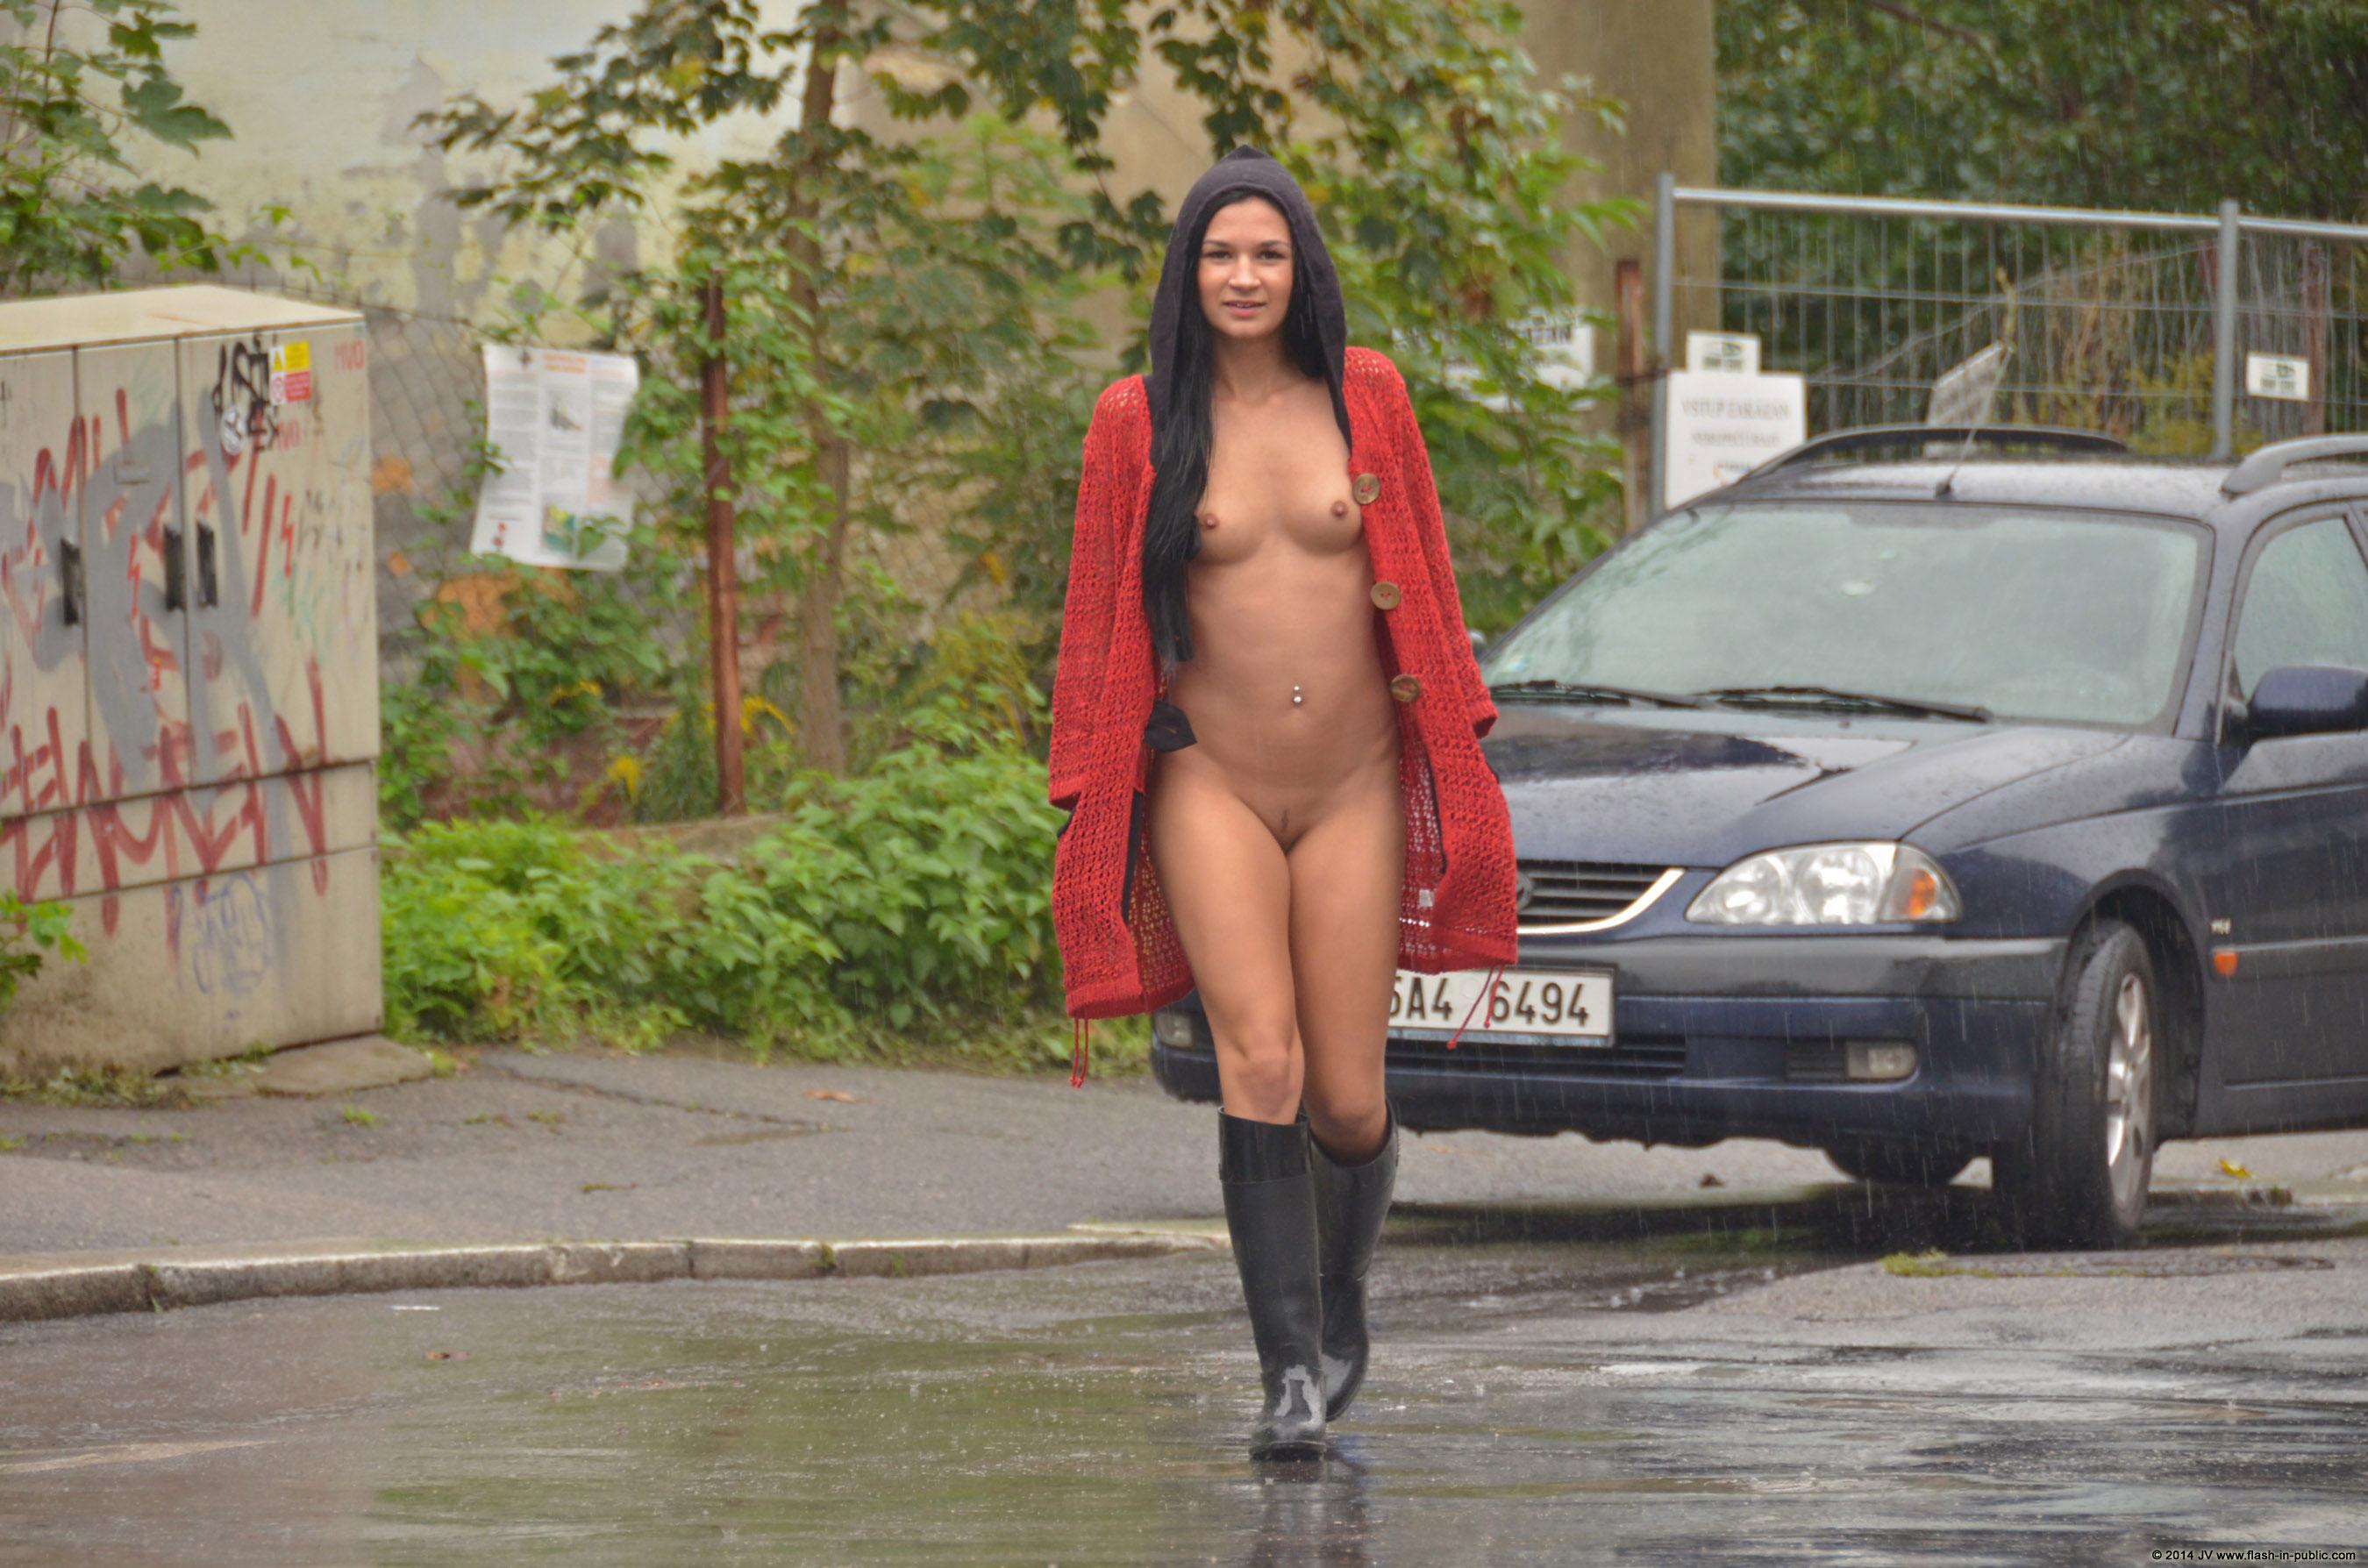 adela-brunette-nude-rain-wet-flash-in-public-17